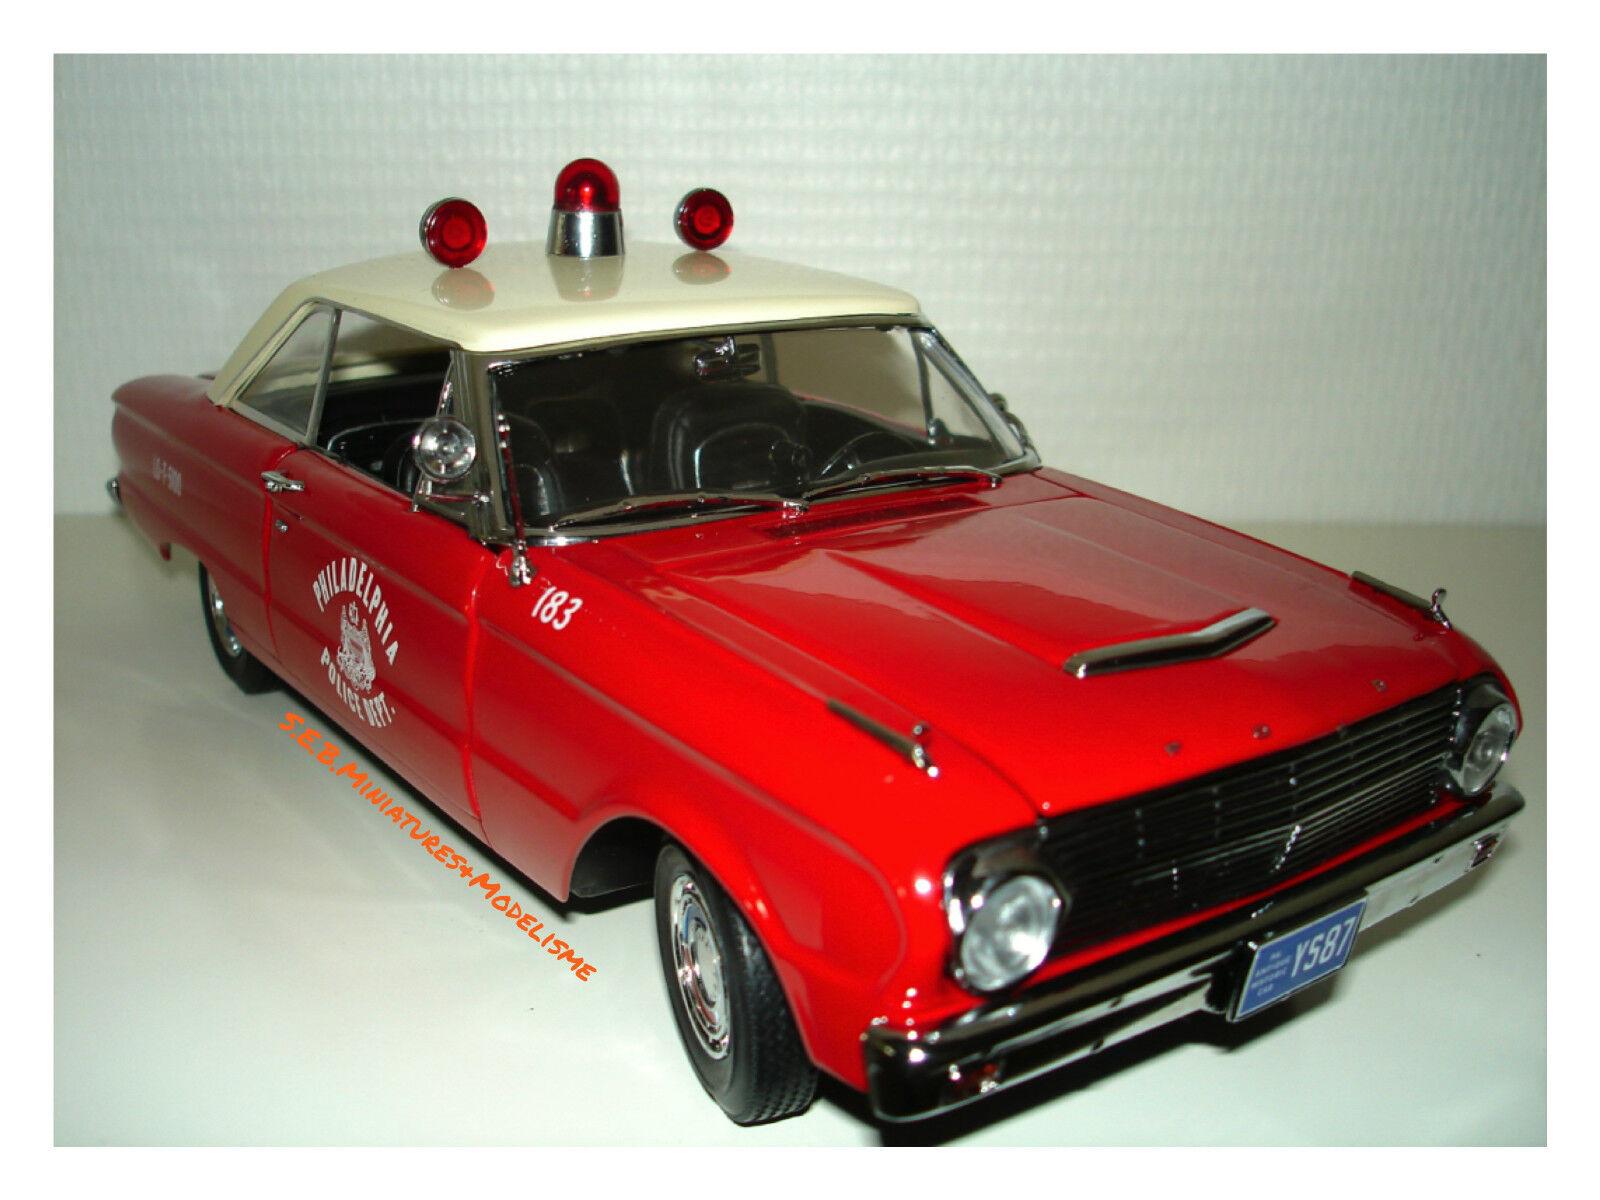 FORD FALCON POLICE DE PHILADELPHIE 1963 1 18 SUN STAR